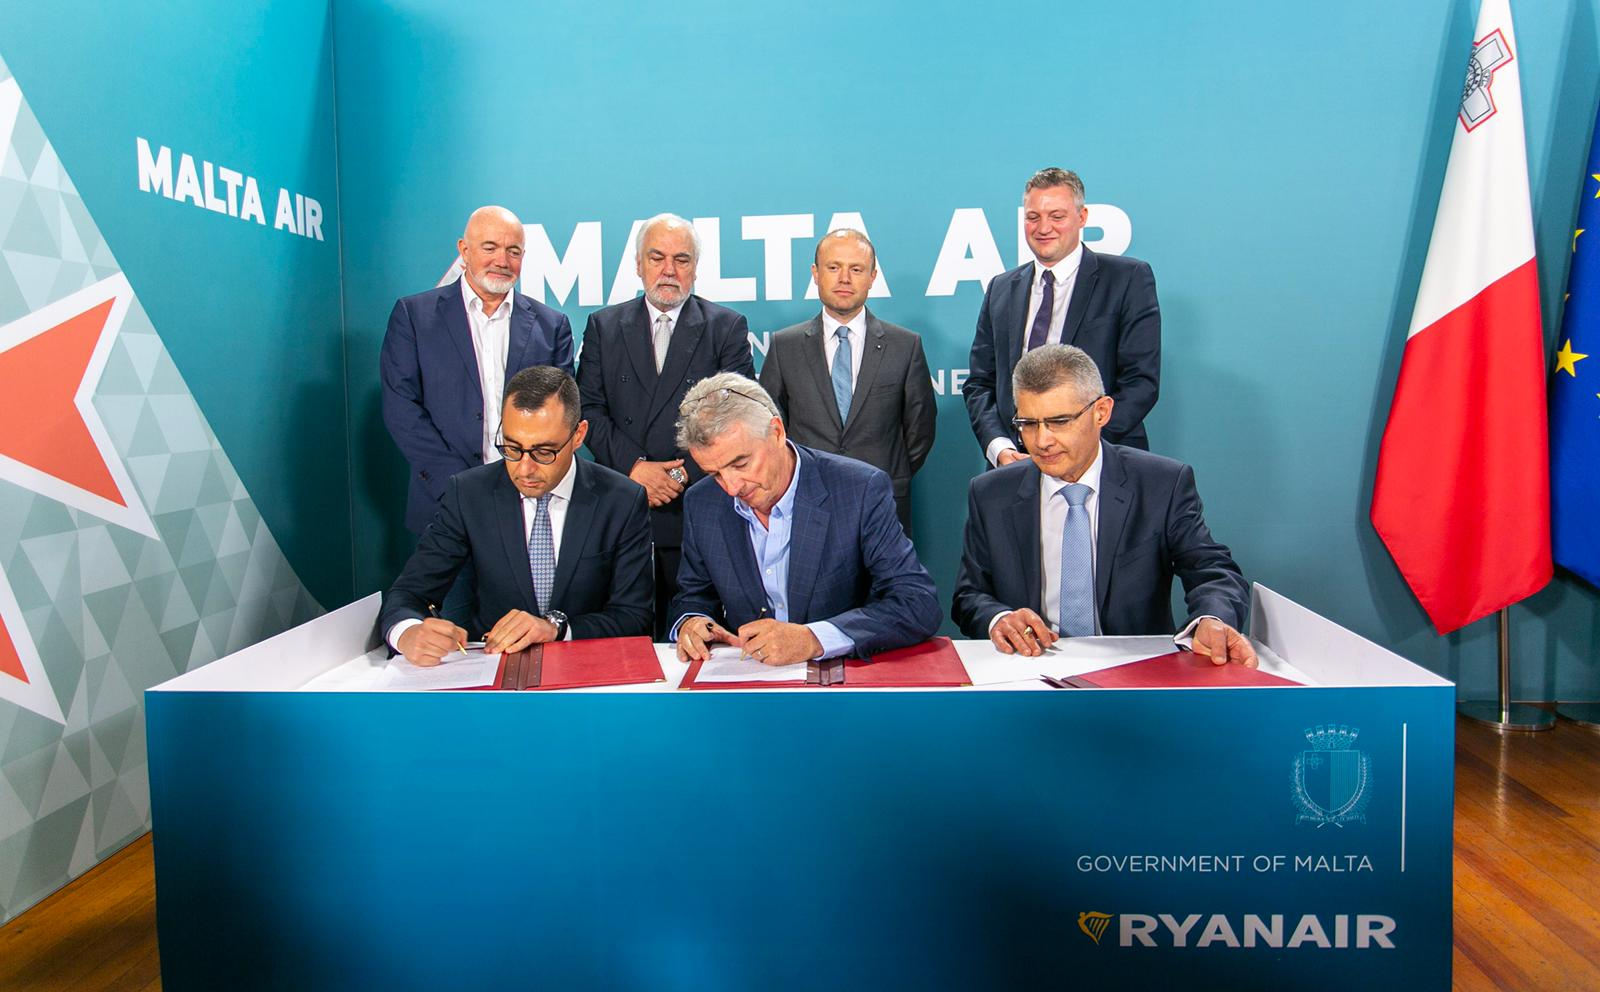 Ryanair купляє Malta Air